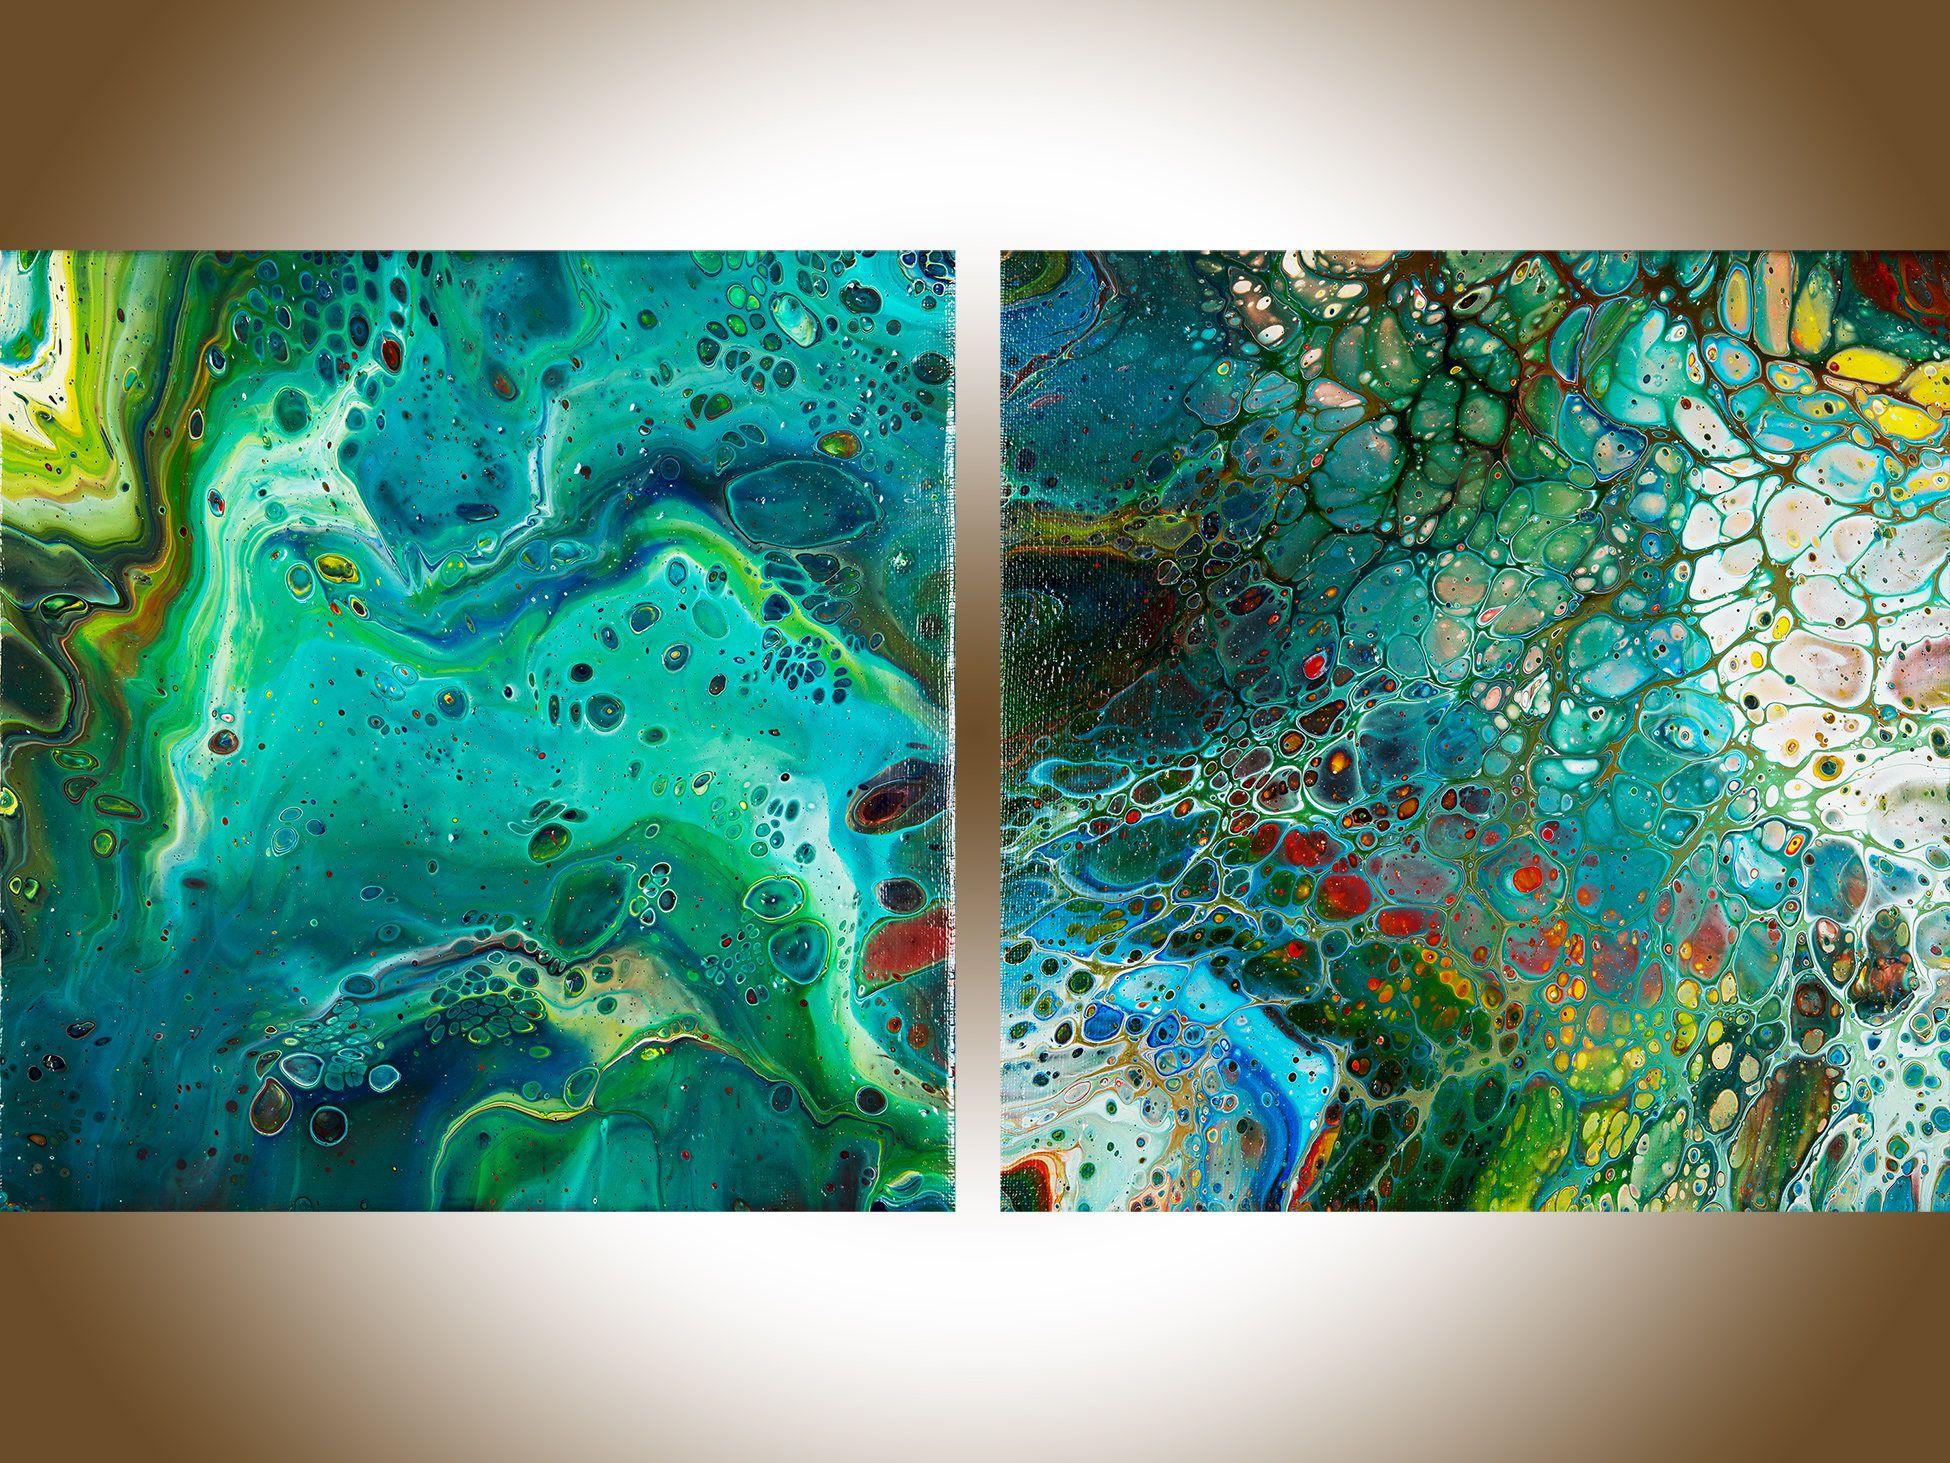 Acryl Giessen Kupfer Blau Malerei Grosse Leinwand Kunst Buro Kunst